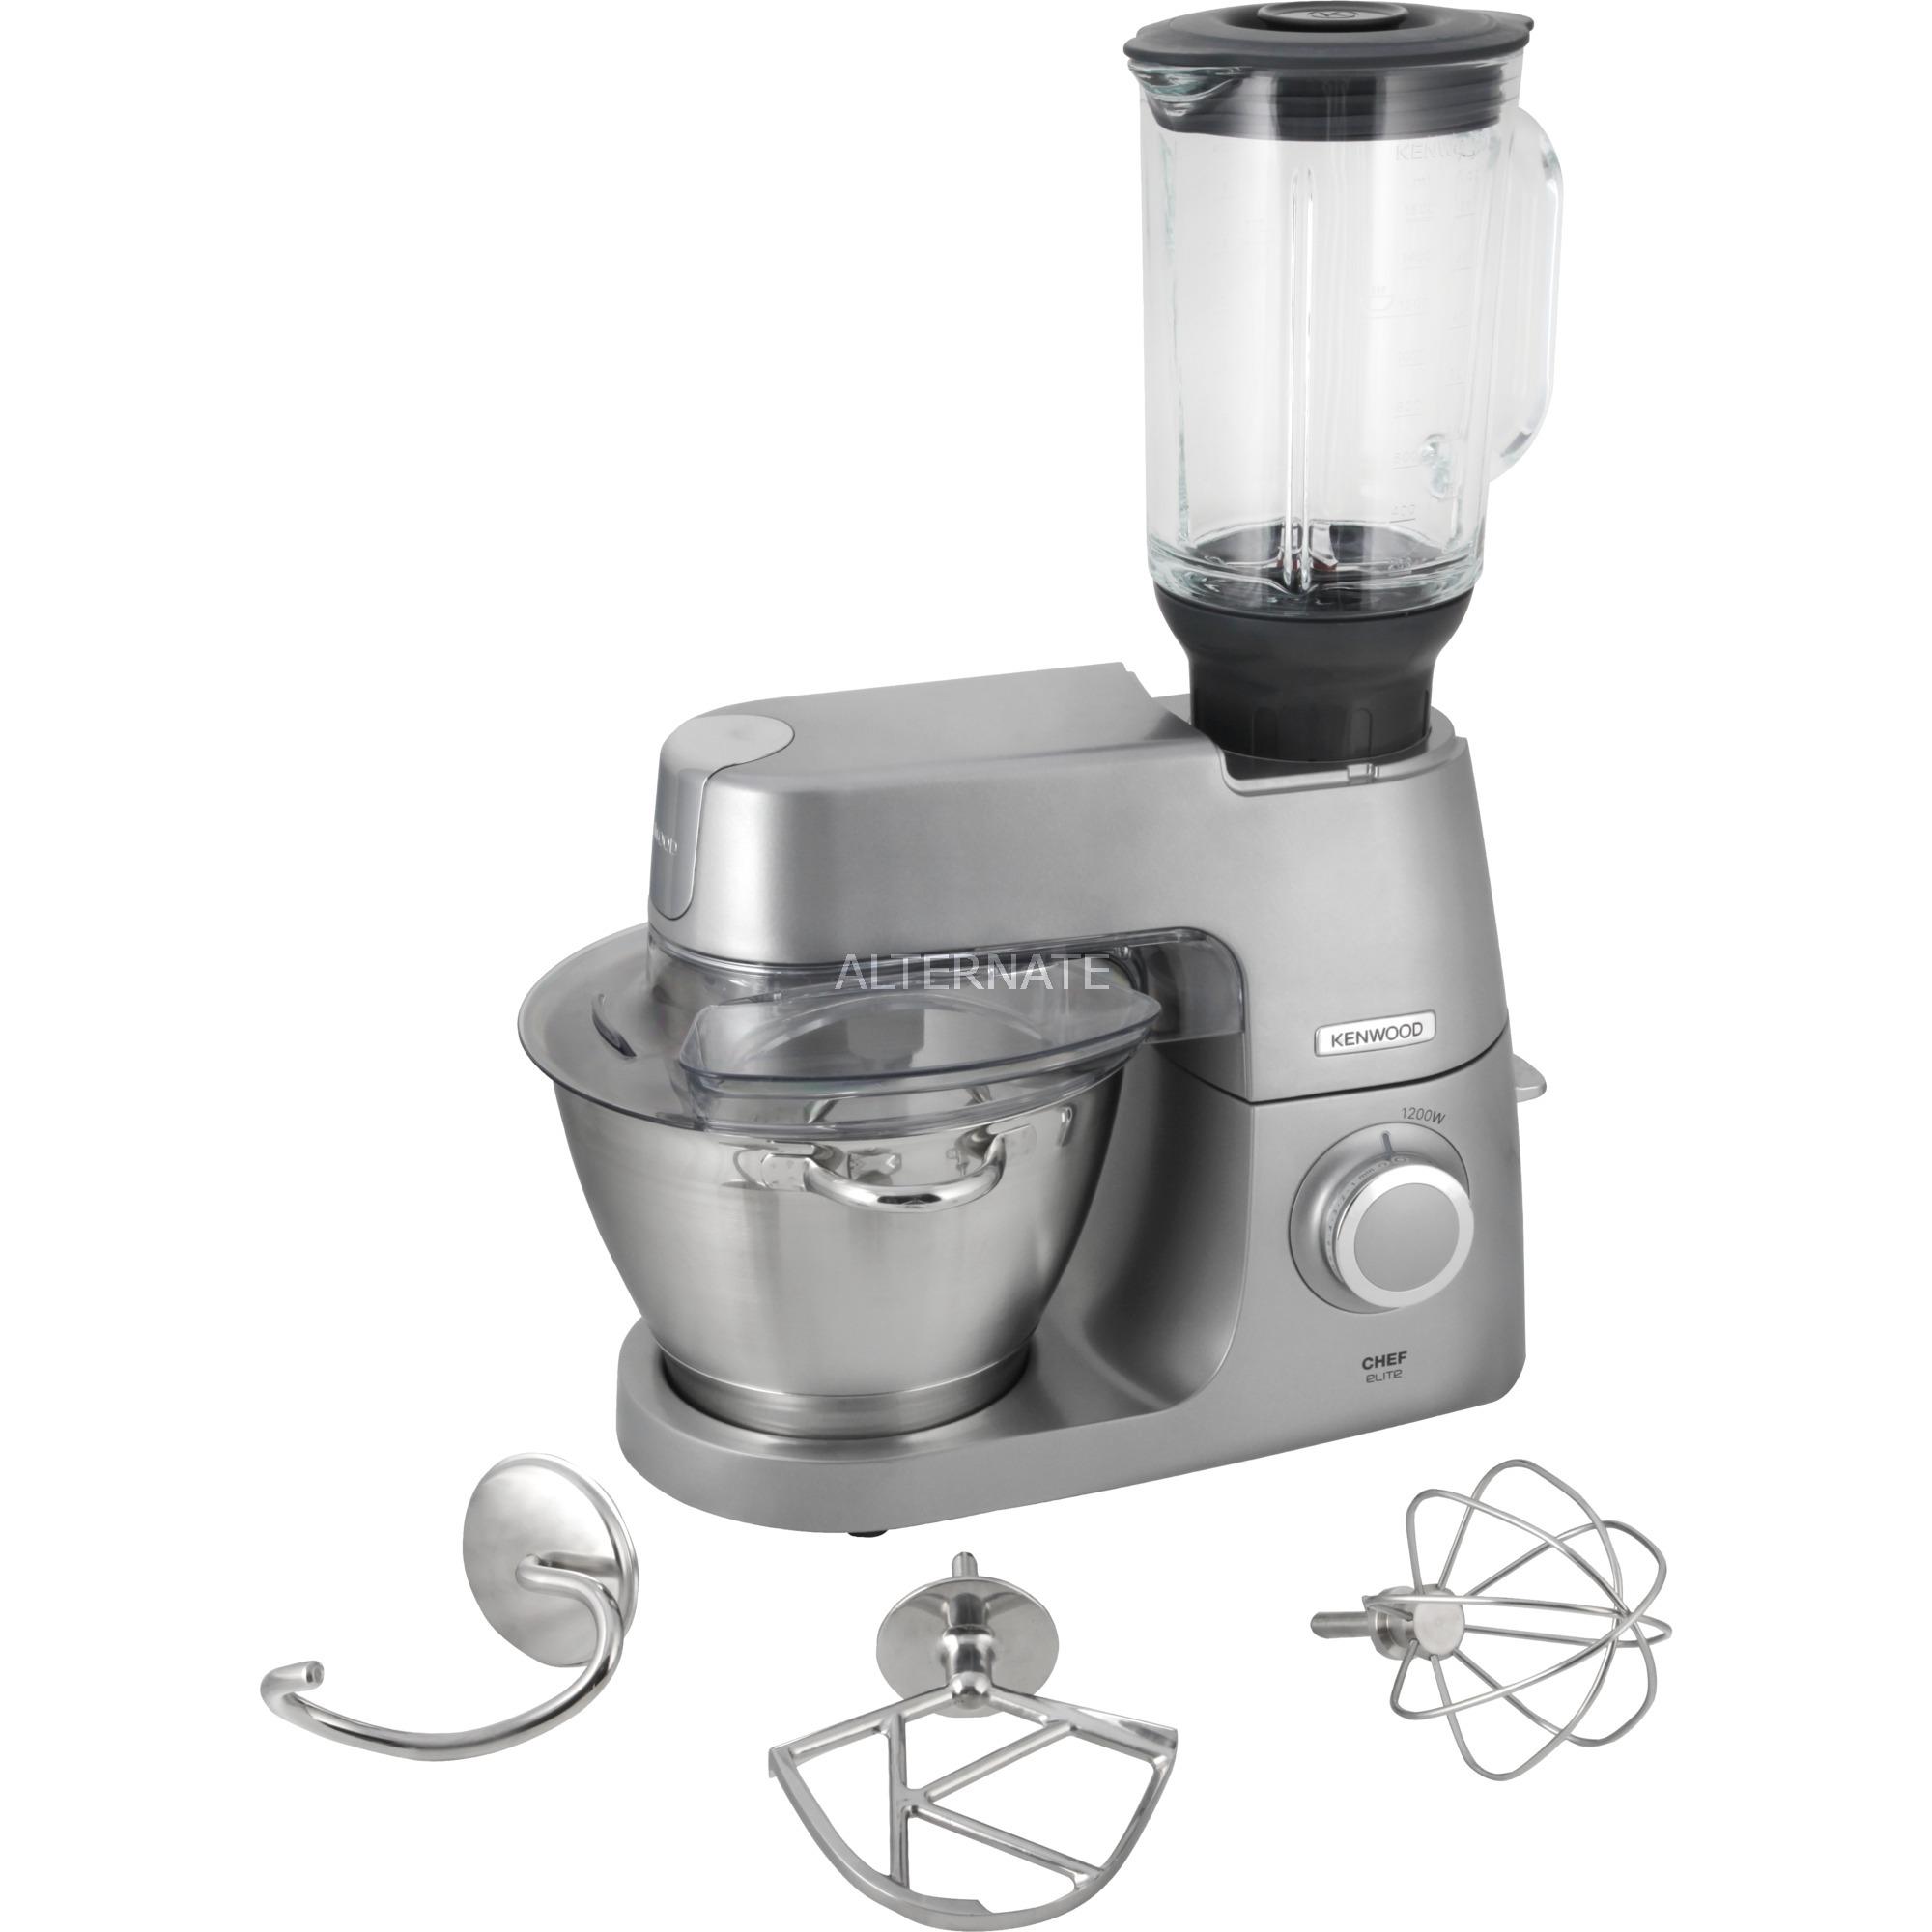 Chef Elite robot da cucina 4,6 L Metallico 1200 W (argento, 4,6 L,  Metallico, Manopola, Alluminio, 1200 W, 430 mm)